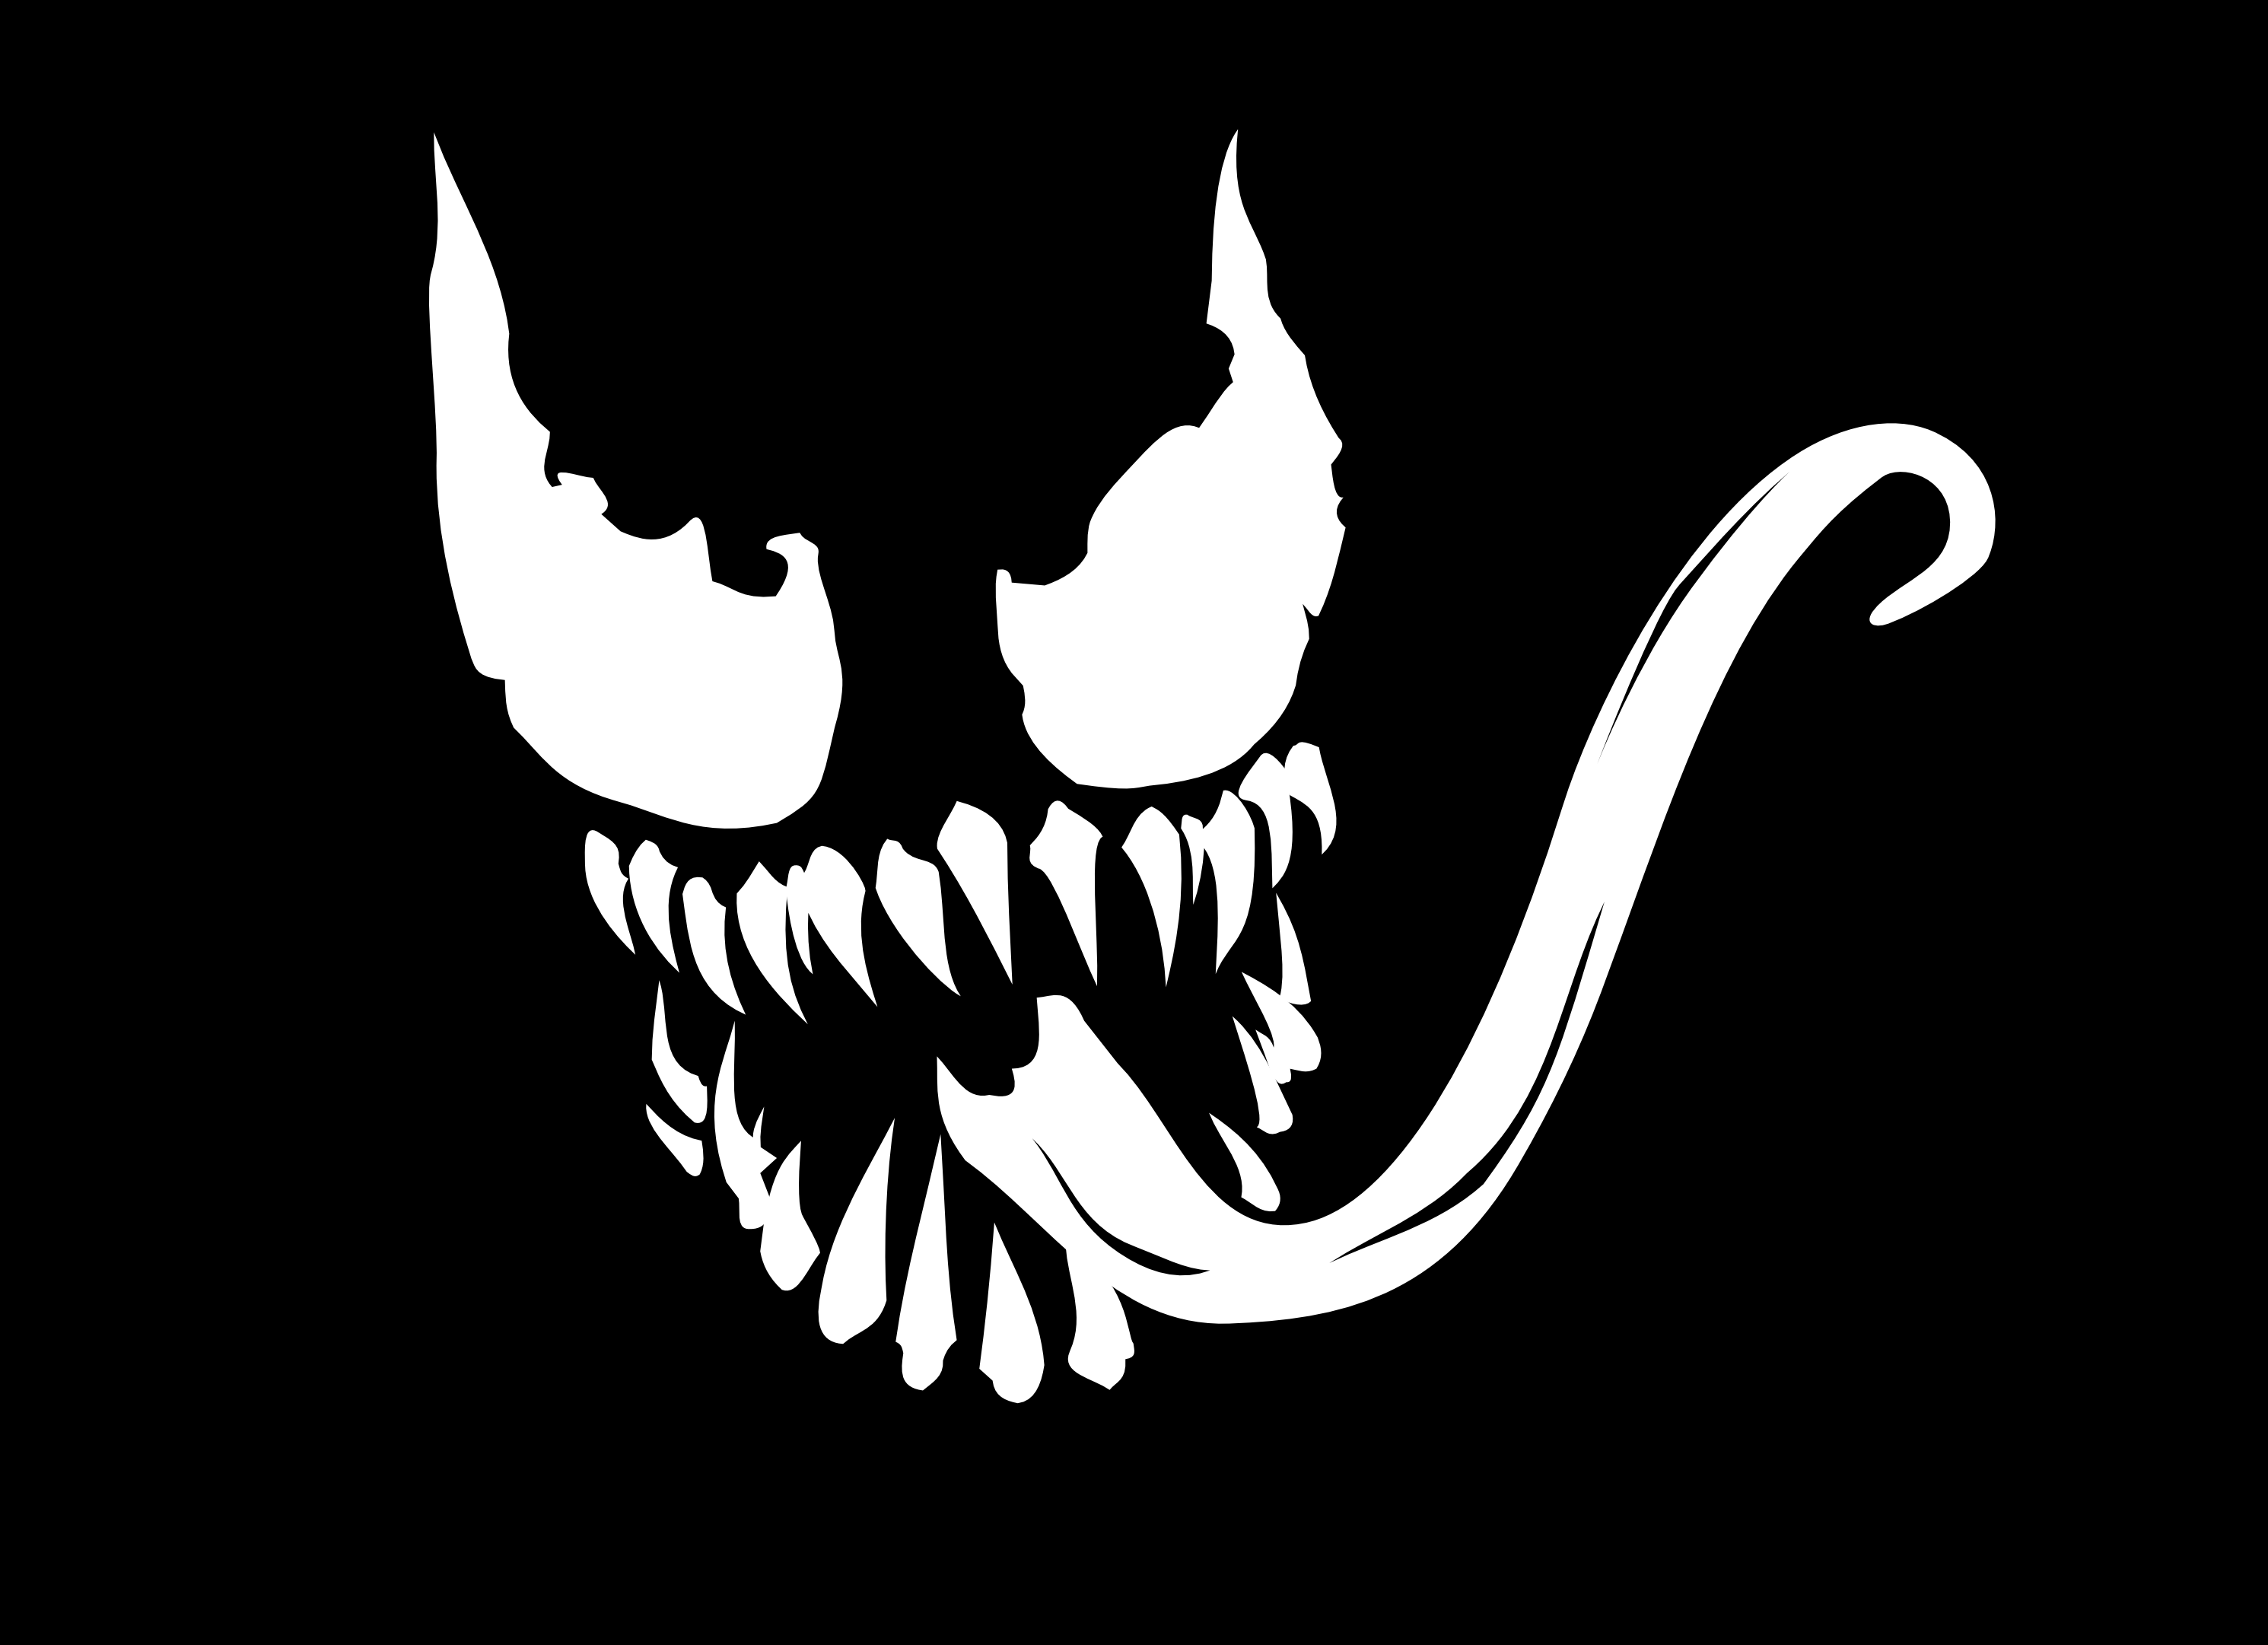 Free Venom Logo Png, Download Free Clip Art, Free Clip Art.